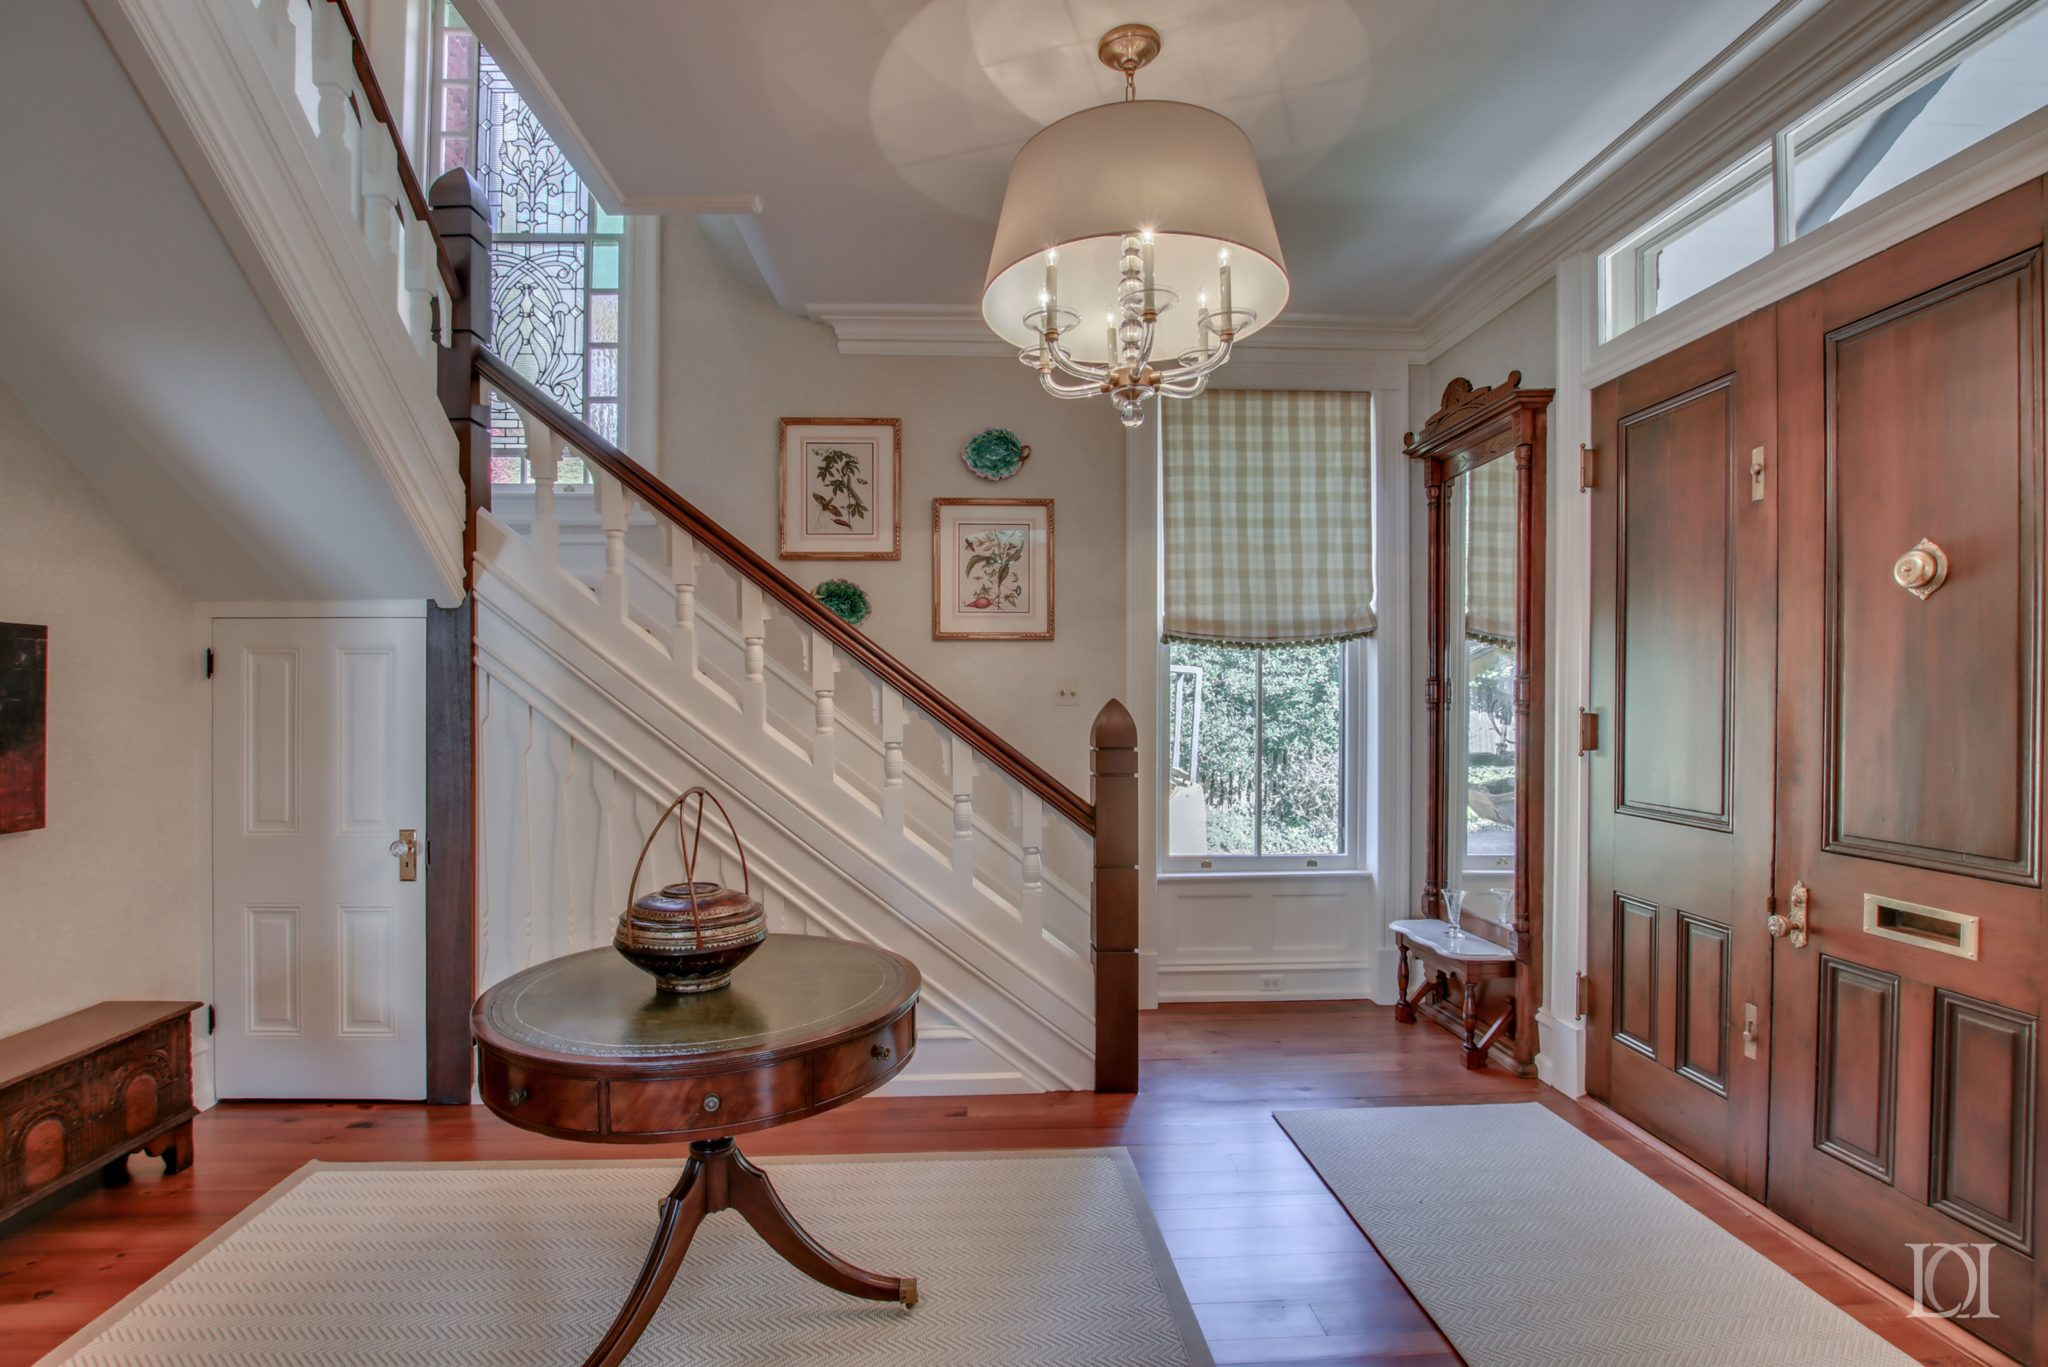 authentic doors stain glass window Gothic style banister pier mirror glass light by Deborah Leamann Interior Design